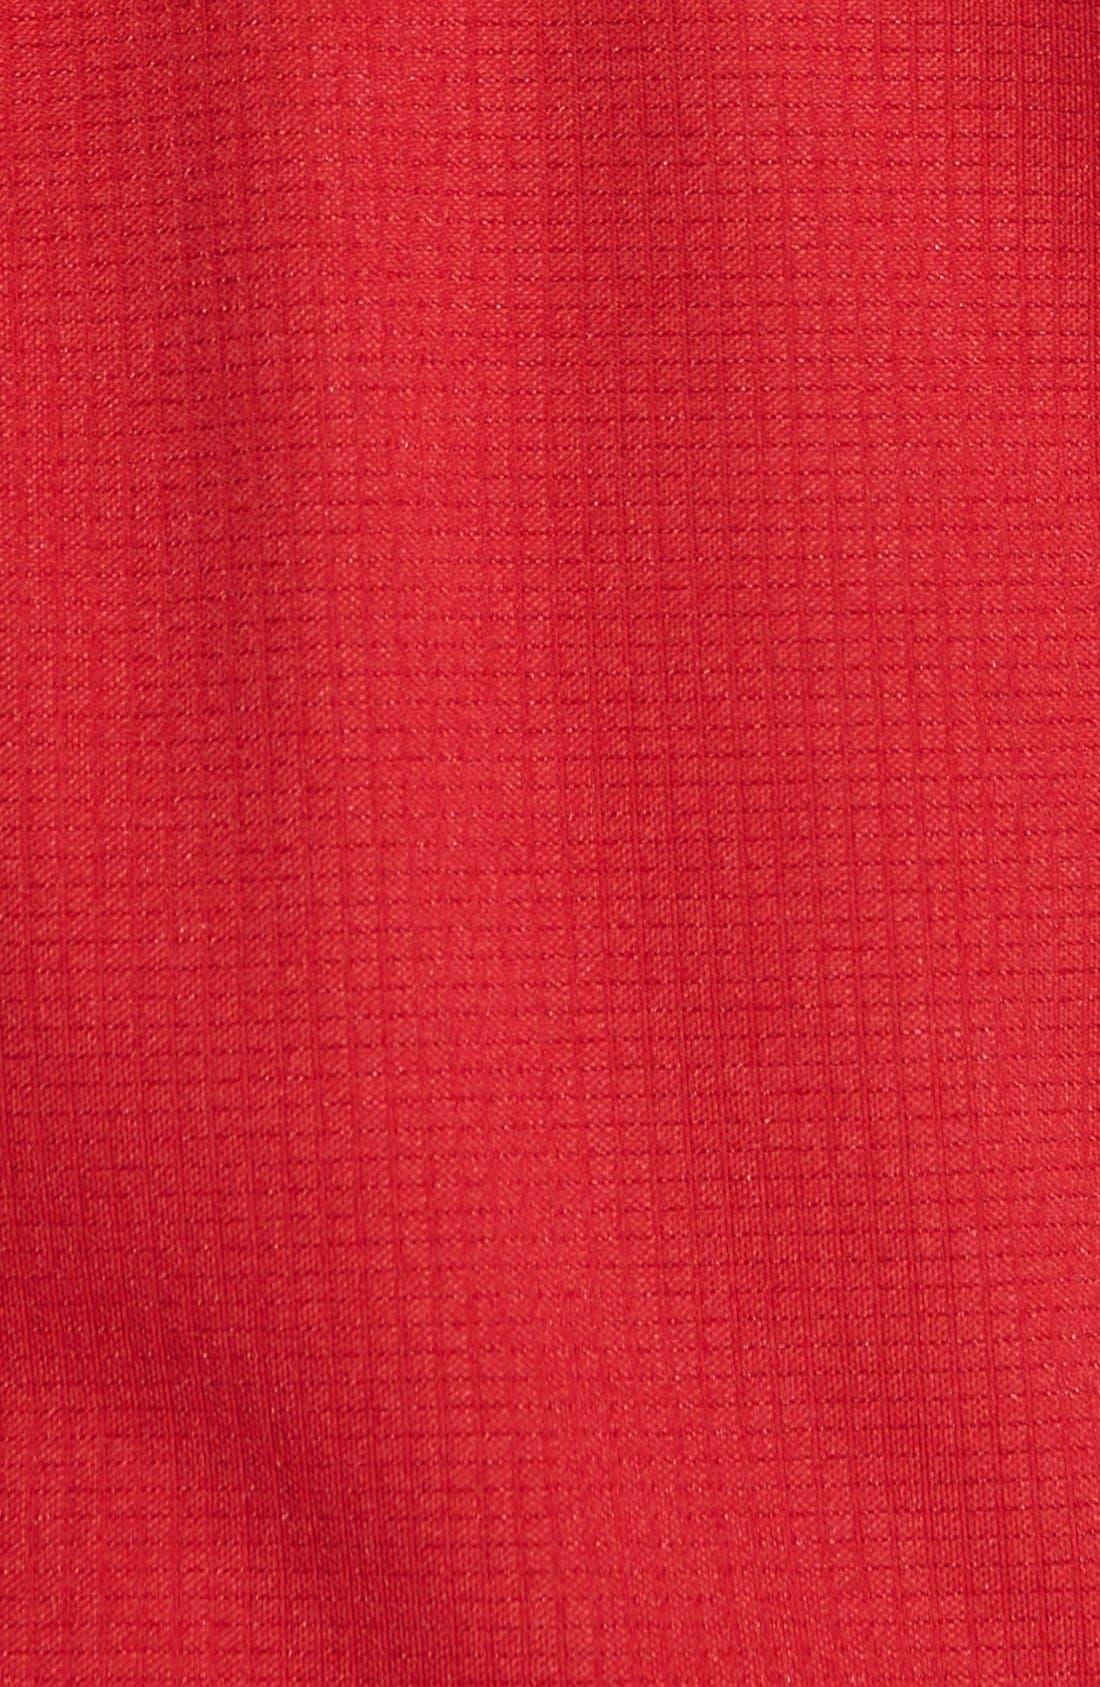 'Genre' DryTec Moisture Wicking Polo,                             Alternate thumbnail 2, color,                             CARDINAL RED